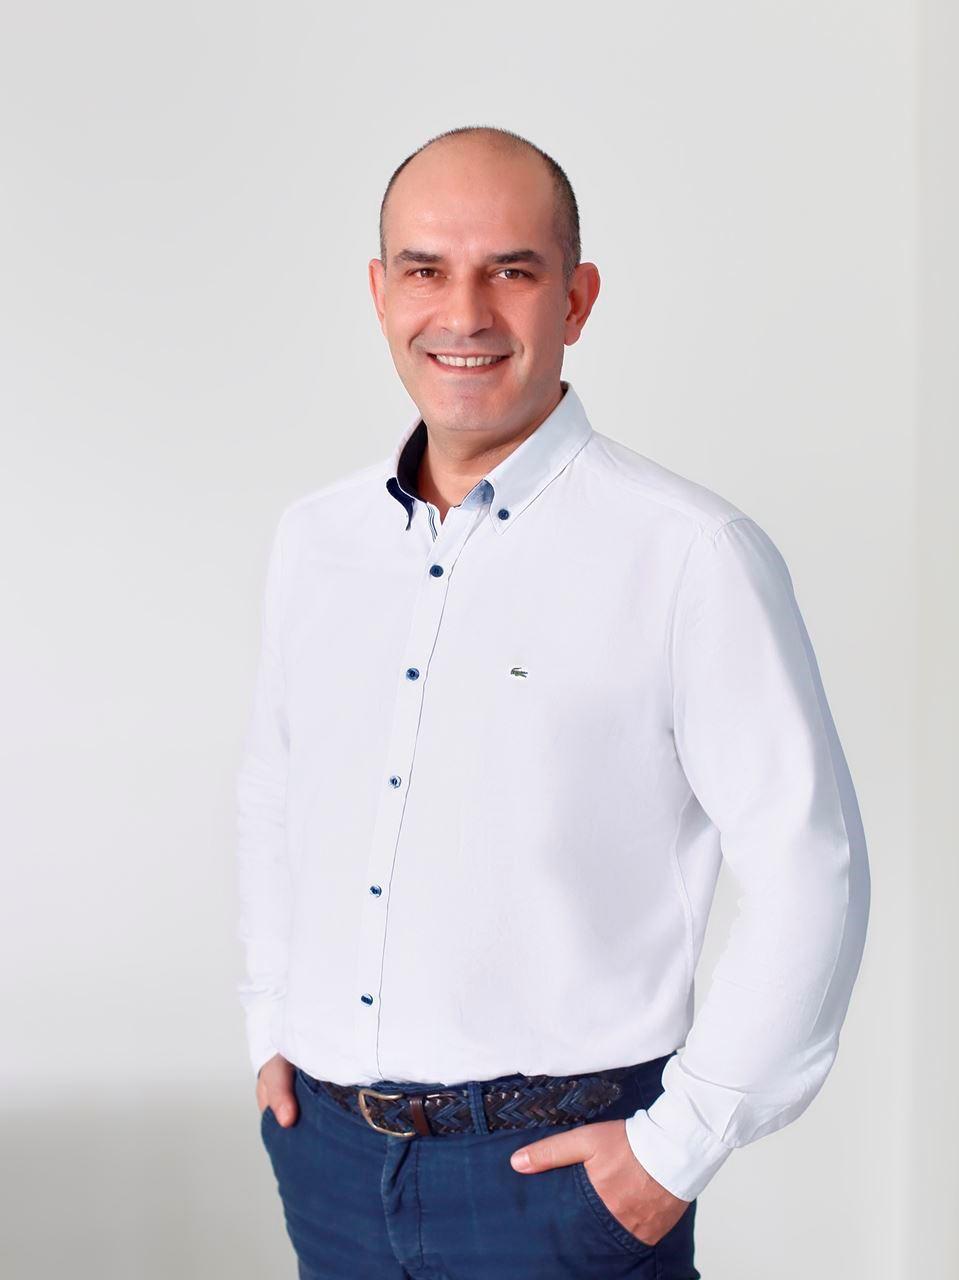 Altay Nalbantoğlu